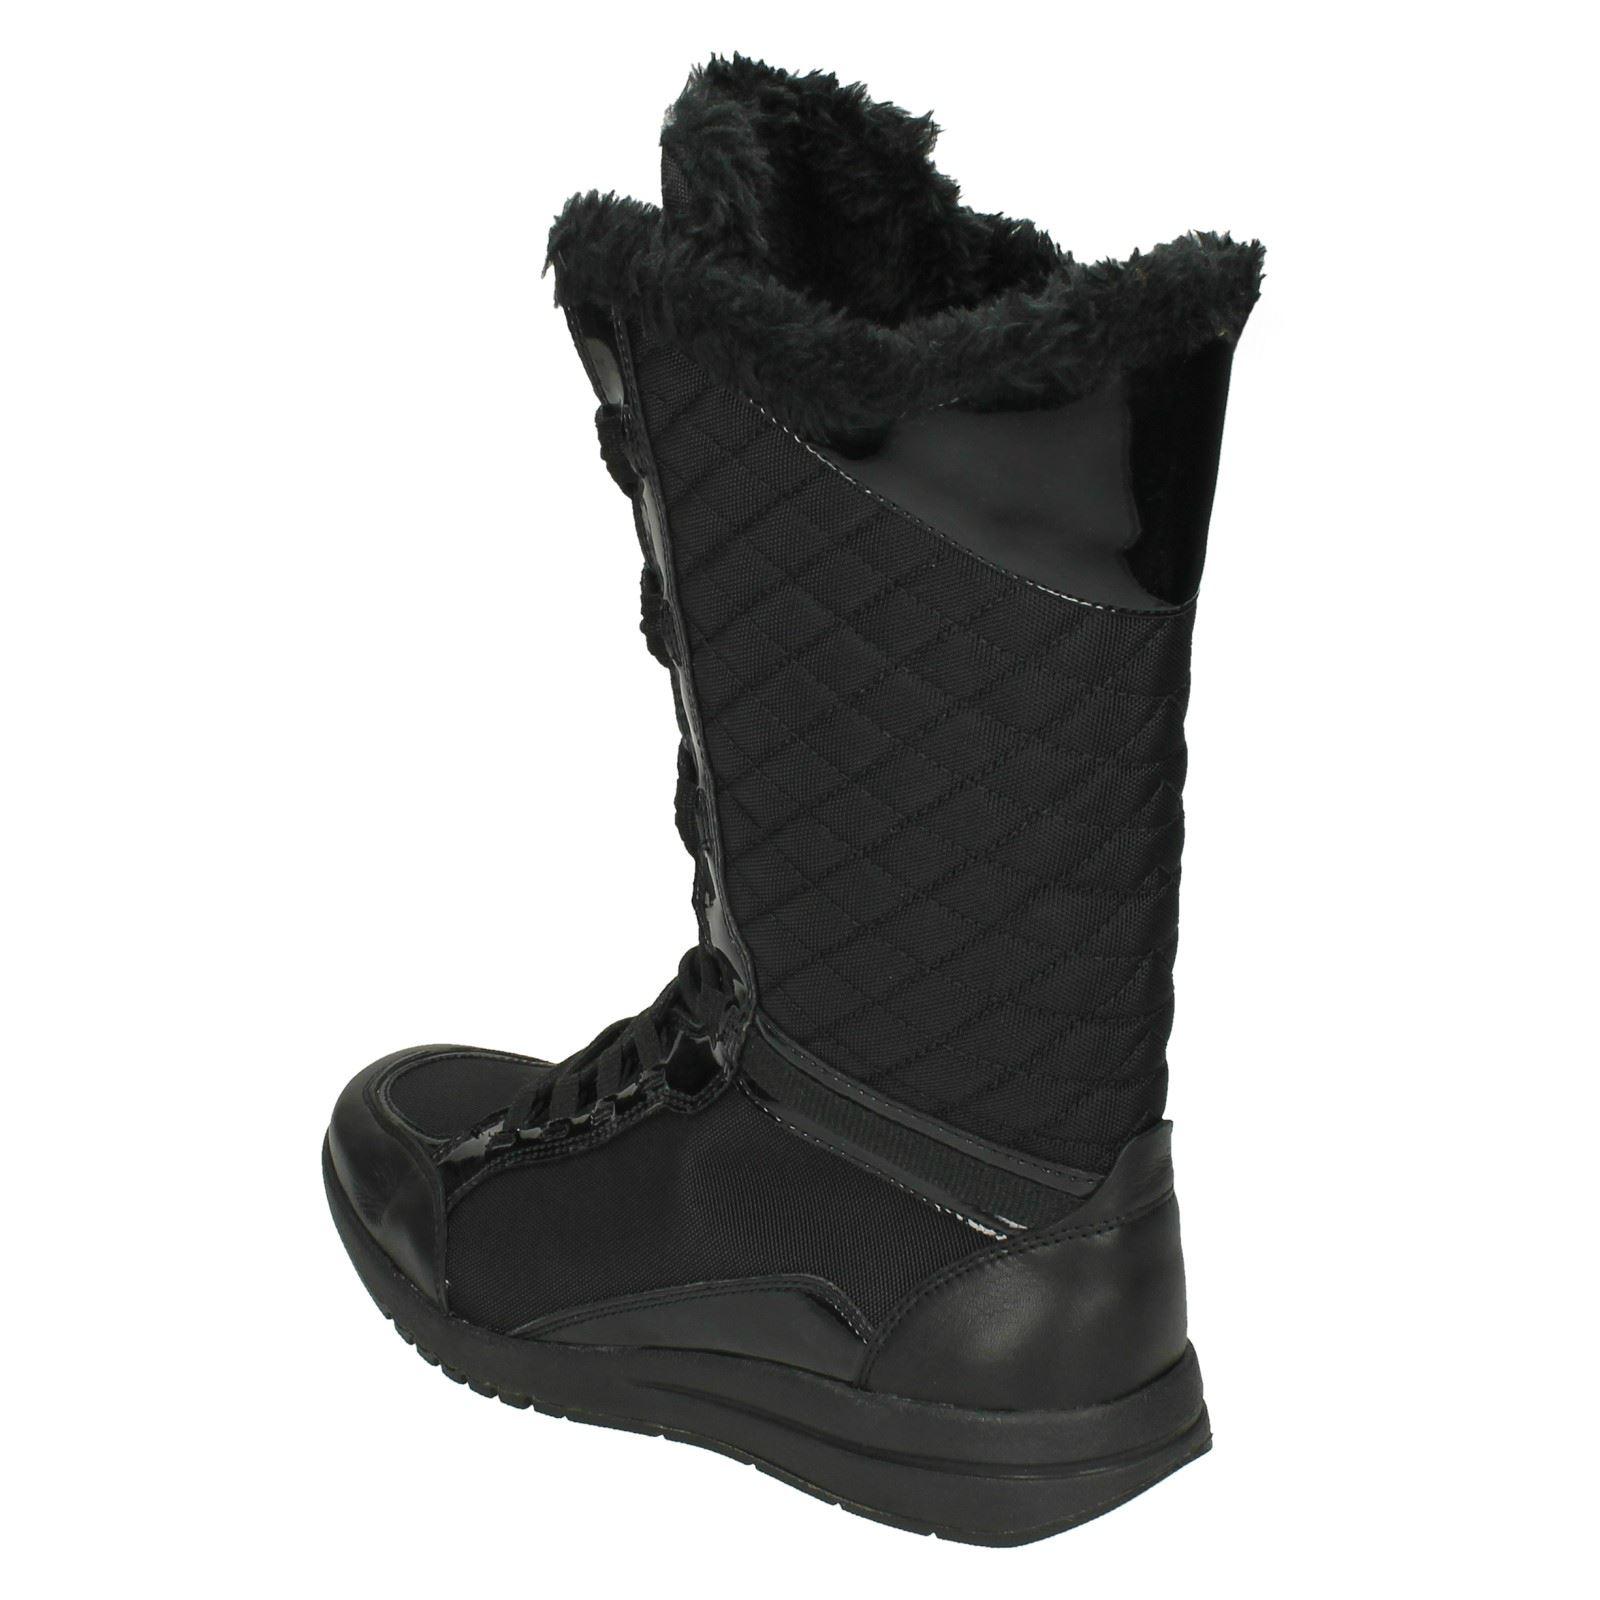 Ladies Rockport Zana Quilted Snow Boots 'K60673'   eBay